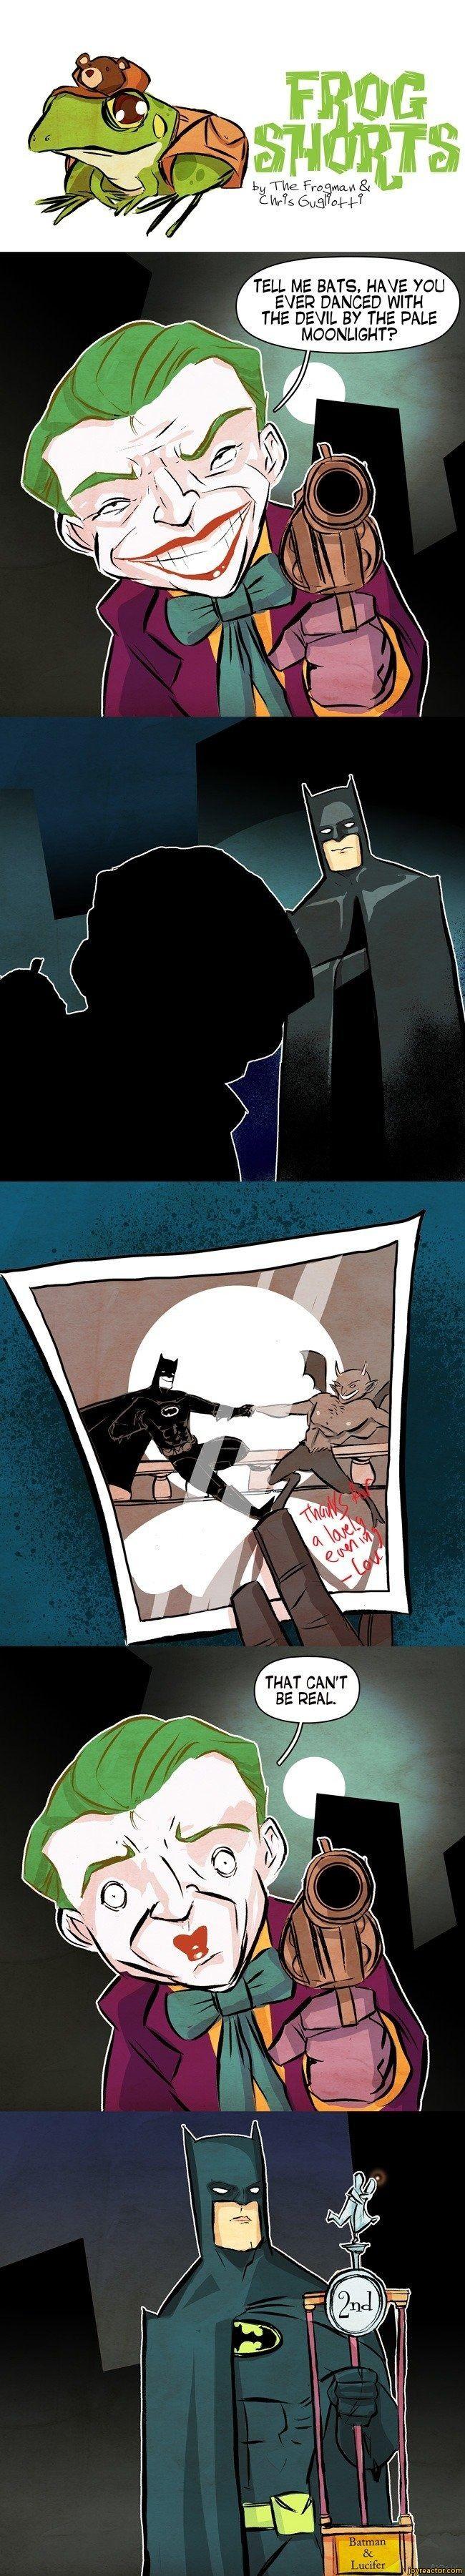 i>LJ TVte. Fro< V\a.\A & Ivu. (SuS^-t-T^TELL ME BATS, HAVE YOU EVER DANCED WITH THE DEVIL BY THE PALE ^ MOONLIGHT? ^THAT CANT BE REAL.BatmanLucifer,comics,funny comics & strips, cartoons,Batman,DC Comics,fandoms,Joker,dance